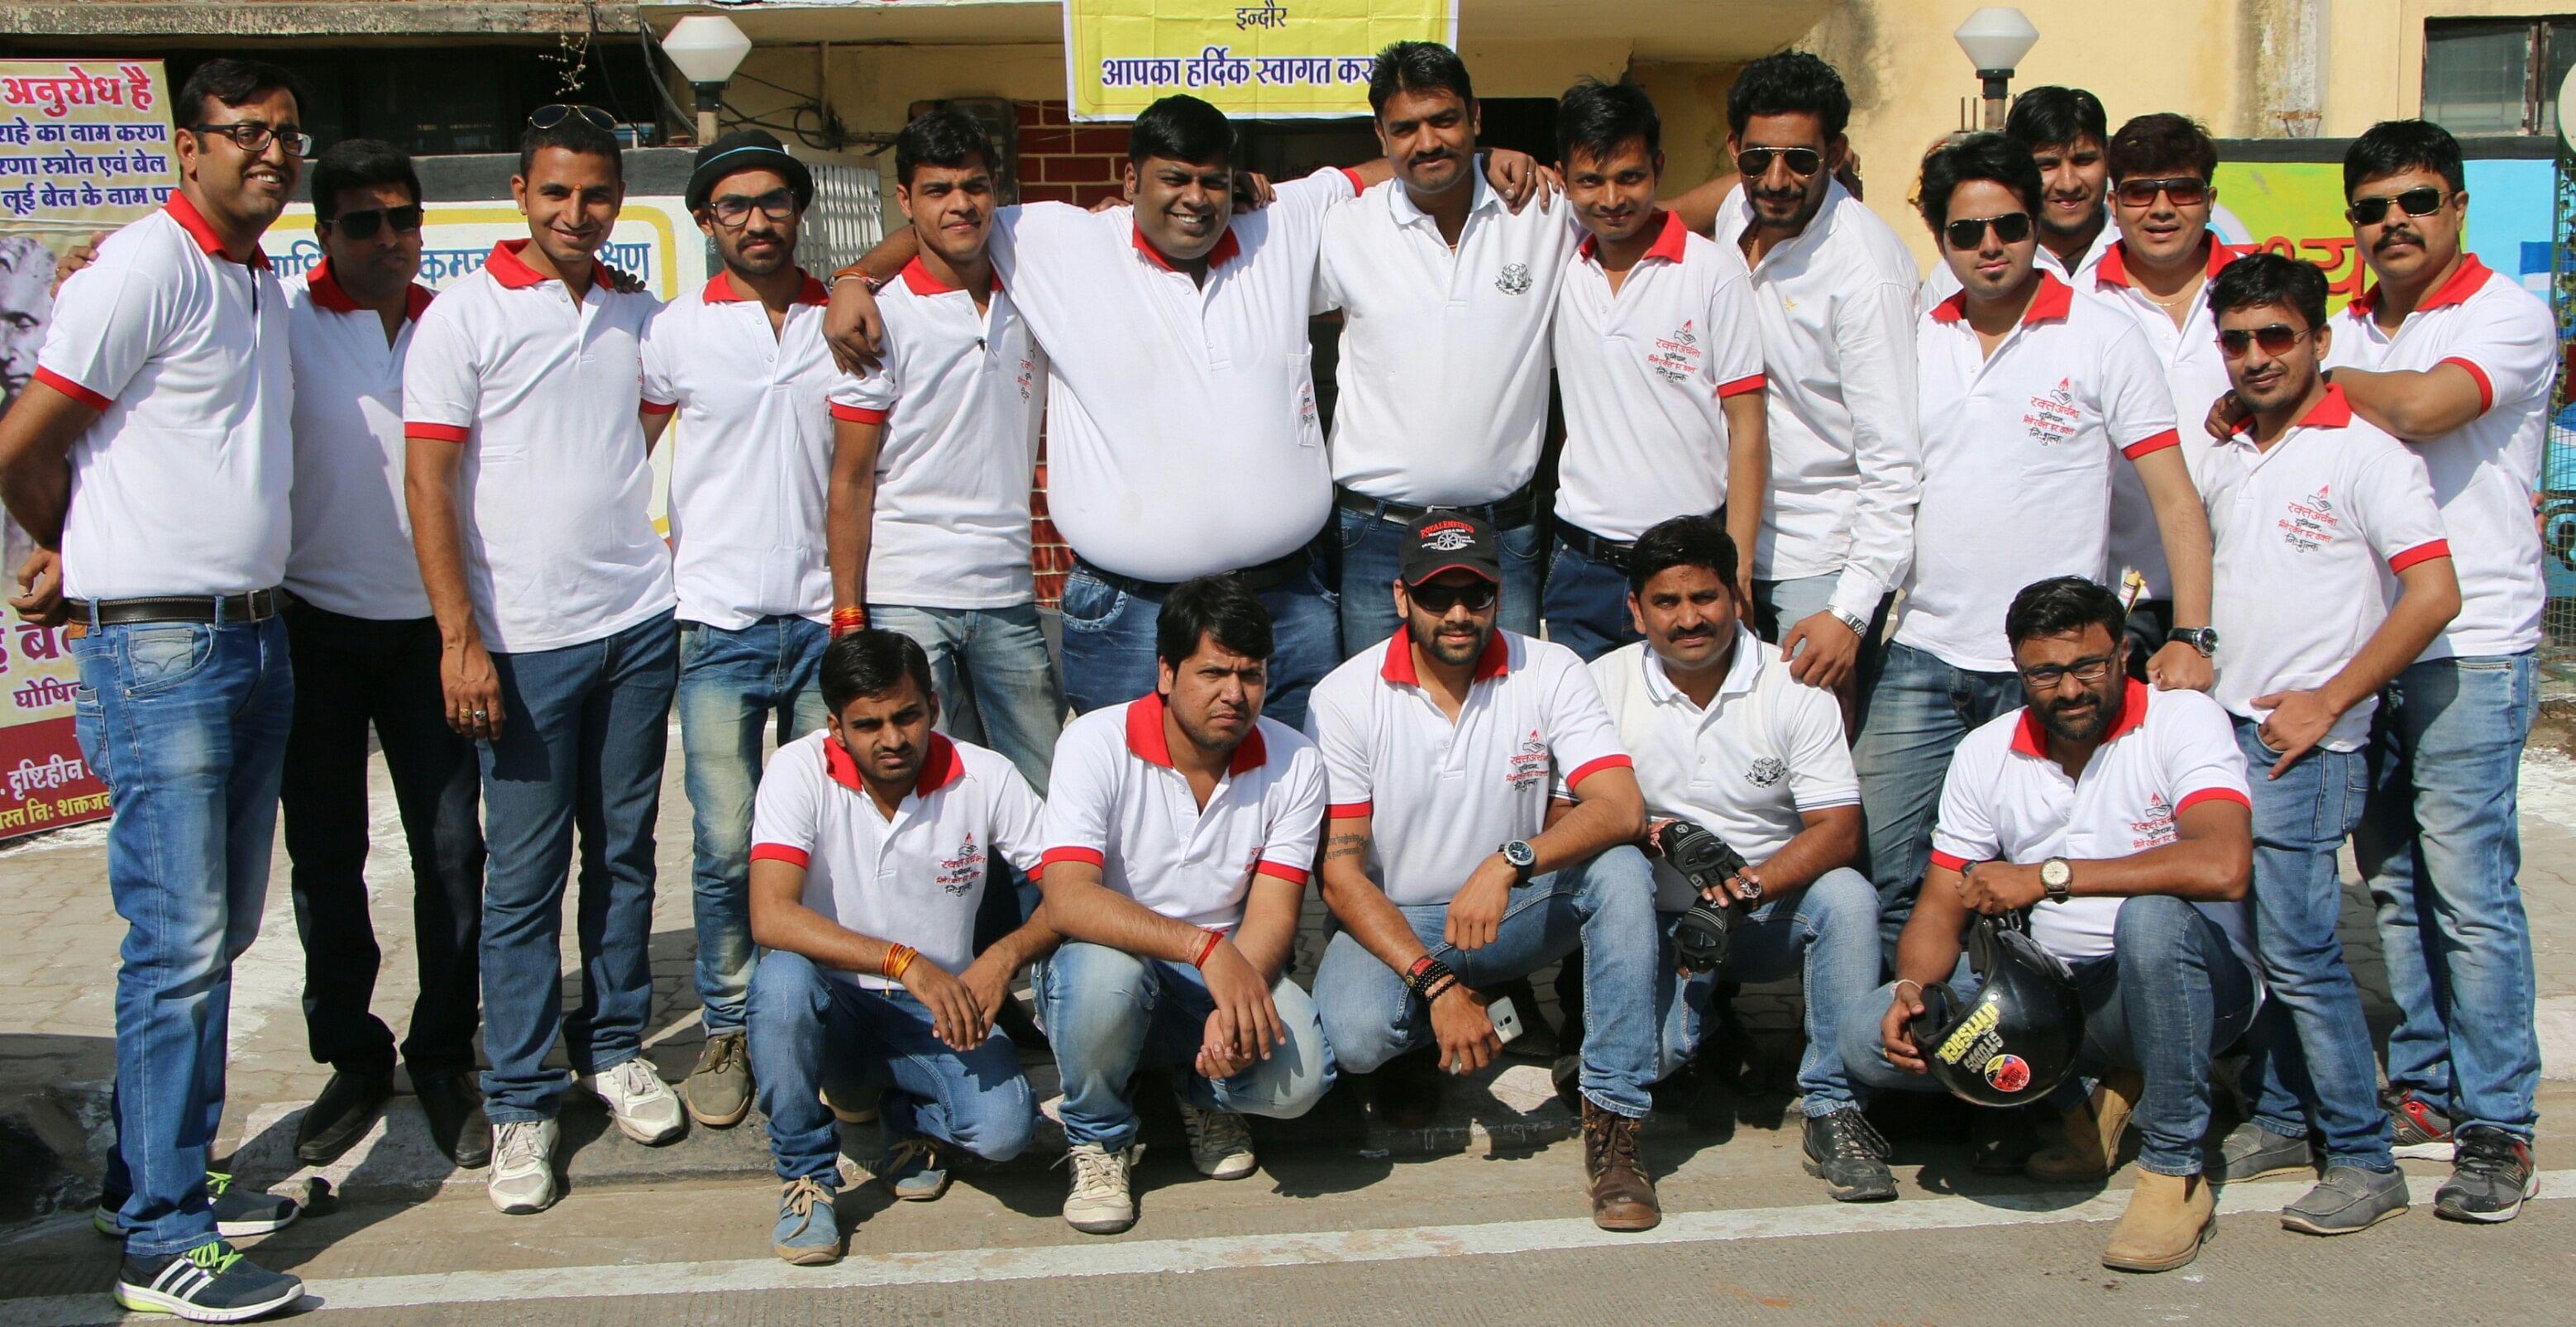 Members of Rakt Archana